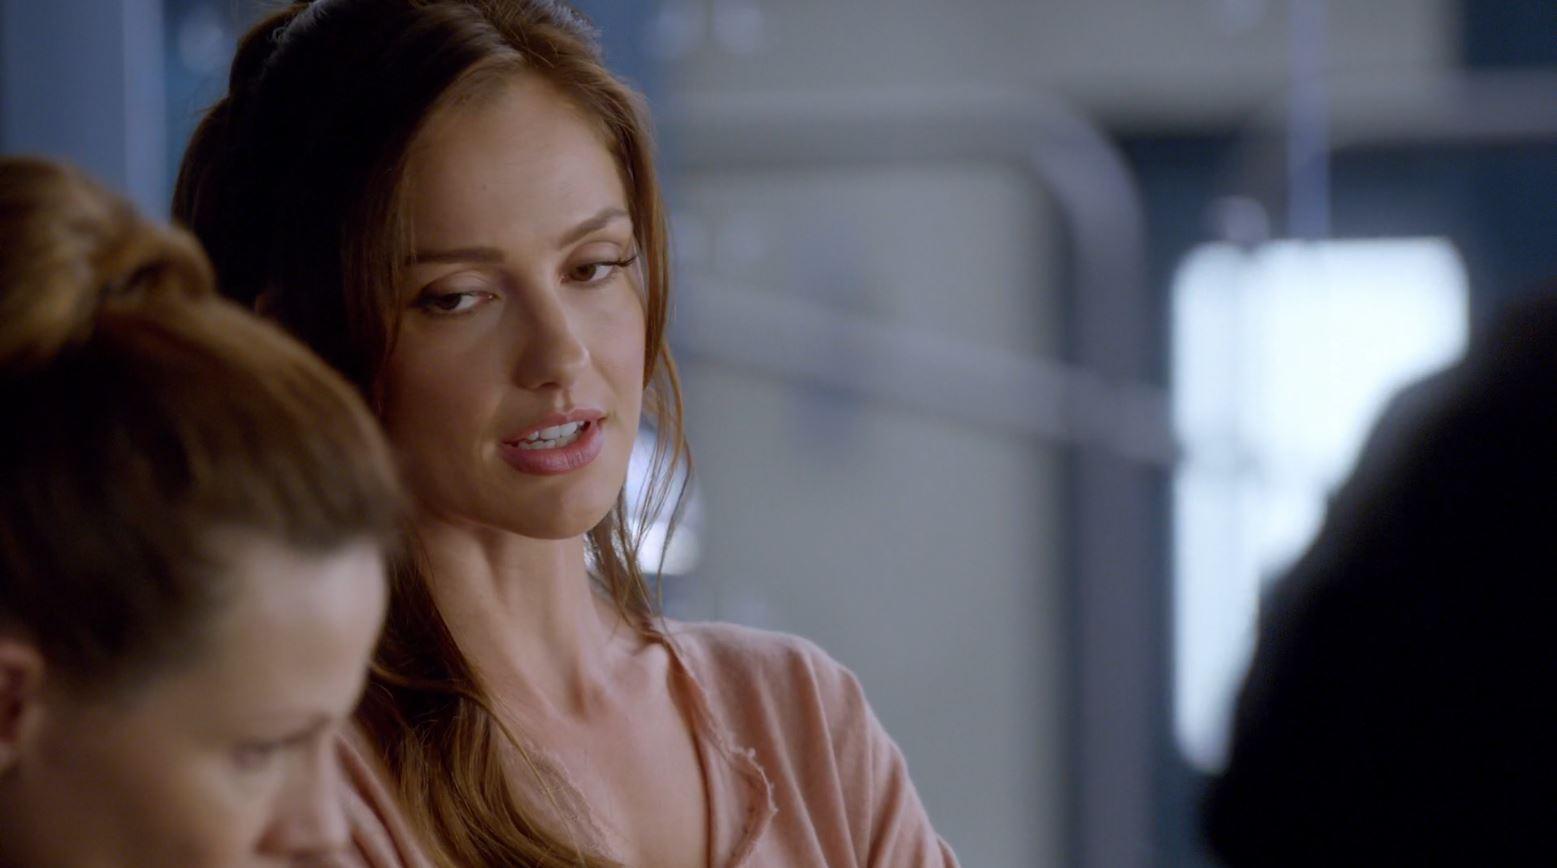 Almost Human - Minka Kelley as Detective Stahl